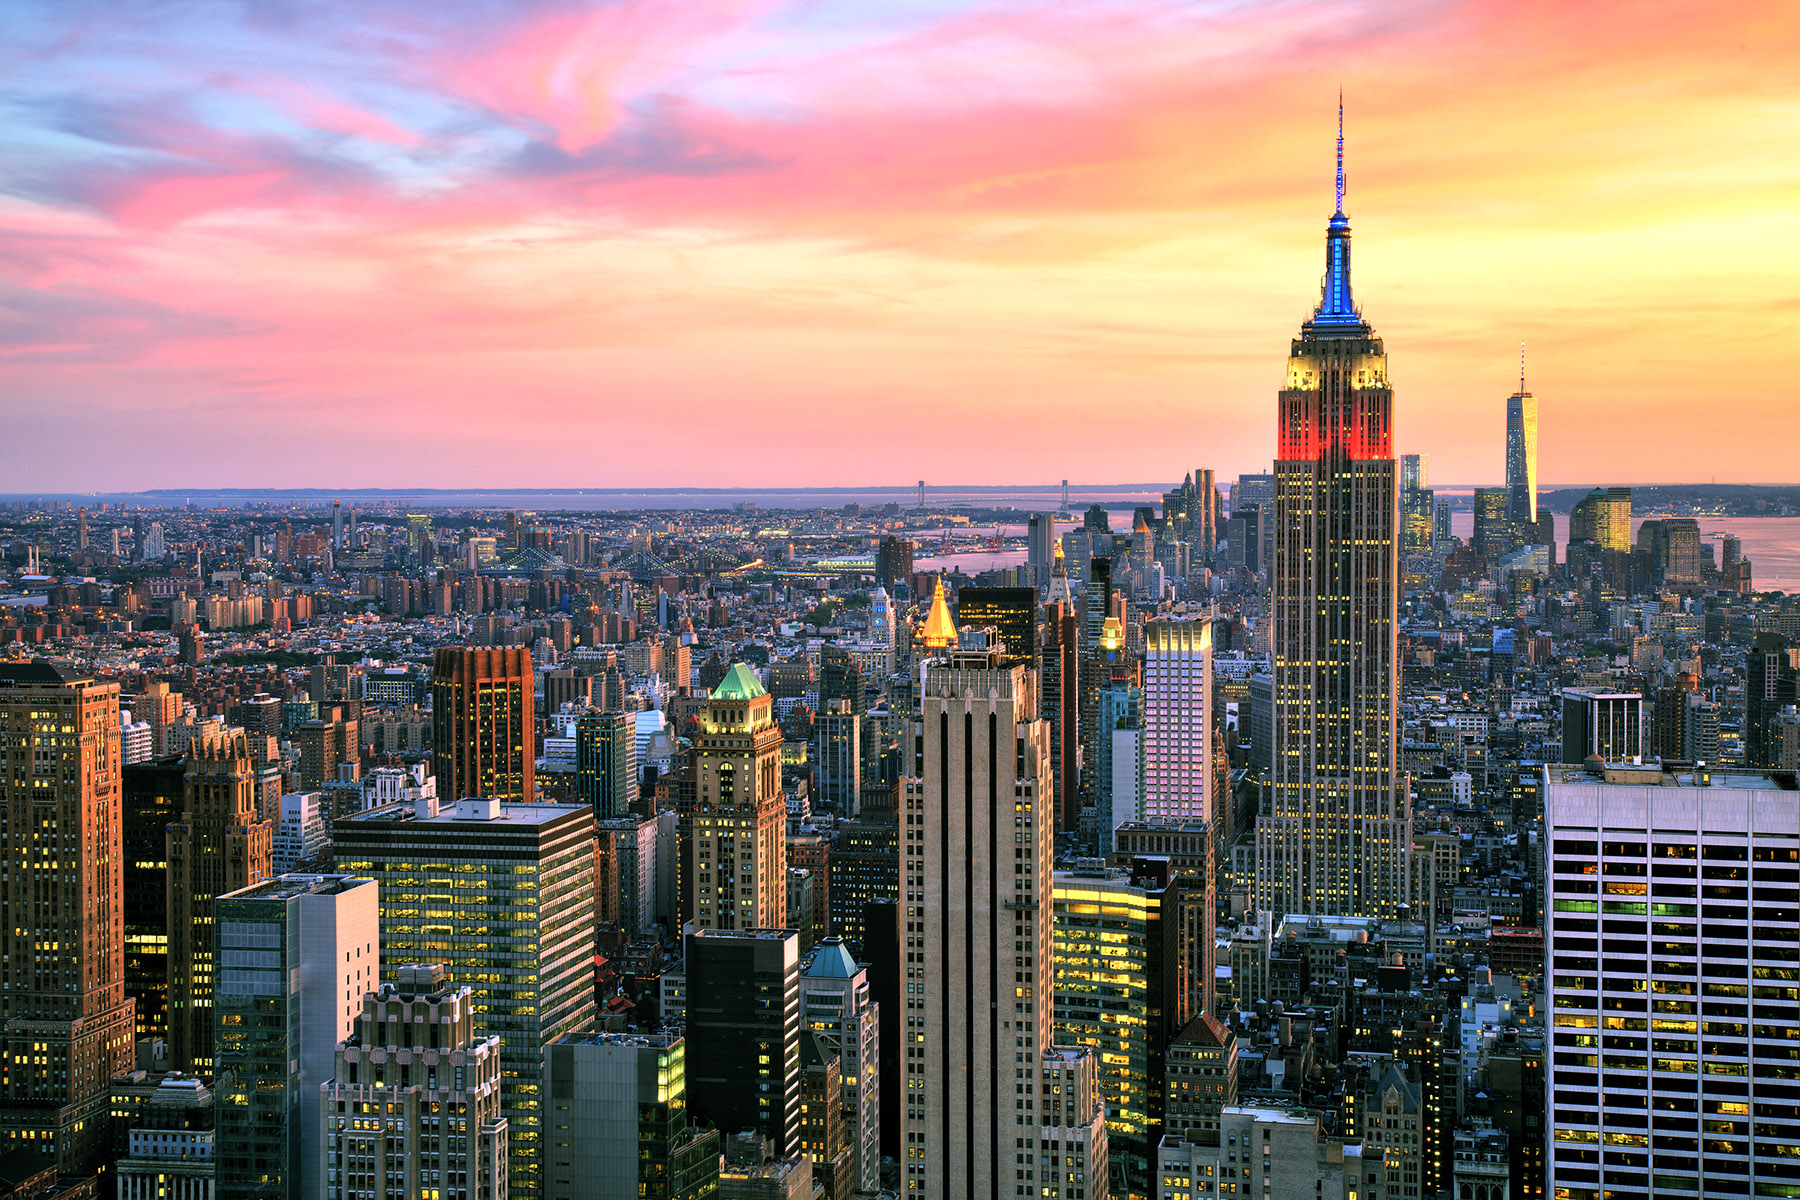 Chrysler_Building_NYC.jpg